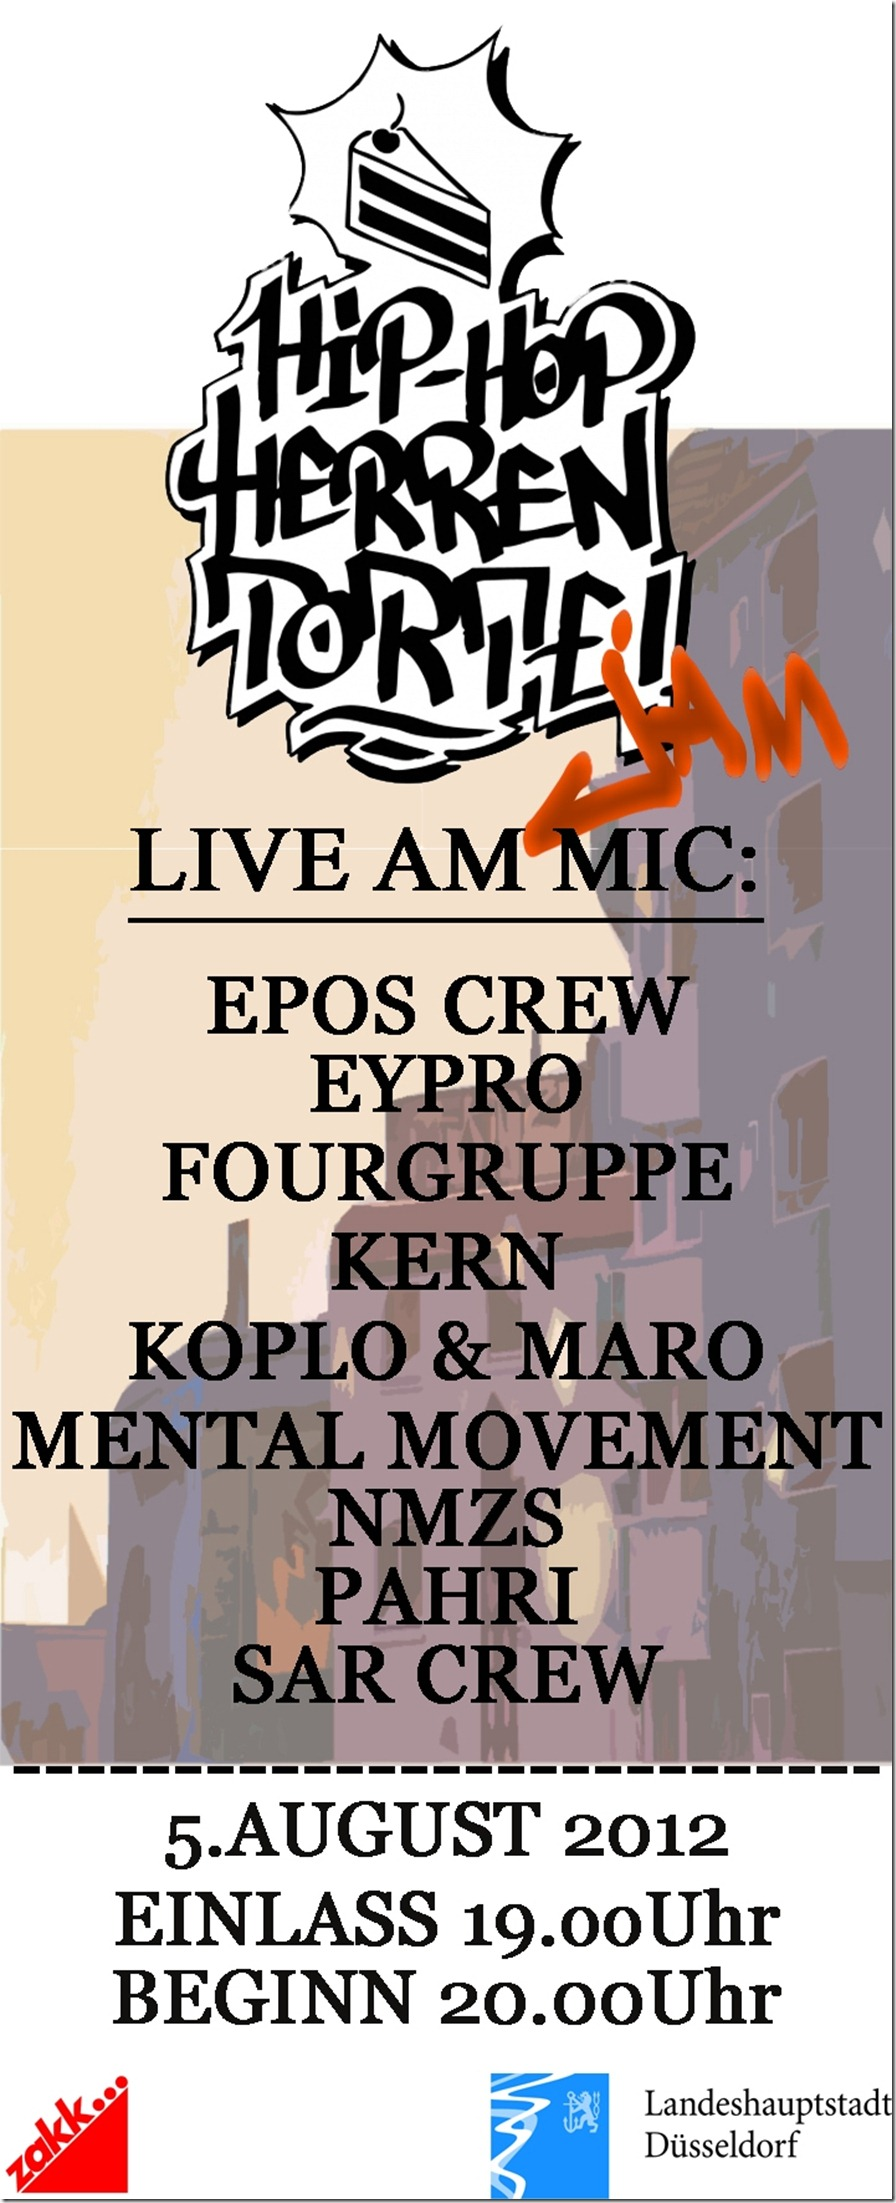 Hip Hop Herrentorte Jam mit Epos Crew, Eypro, Fourgruppe, Kern, Koplo & Maro, Mental Movement, NMZS, Pahri & SAR Crew (FLYER)